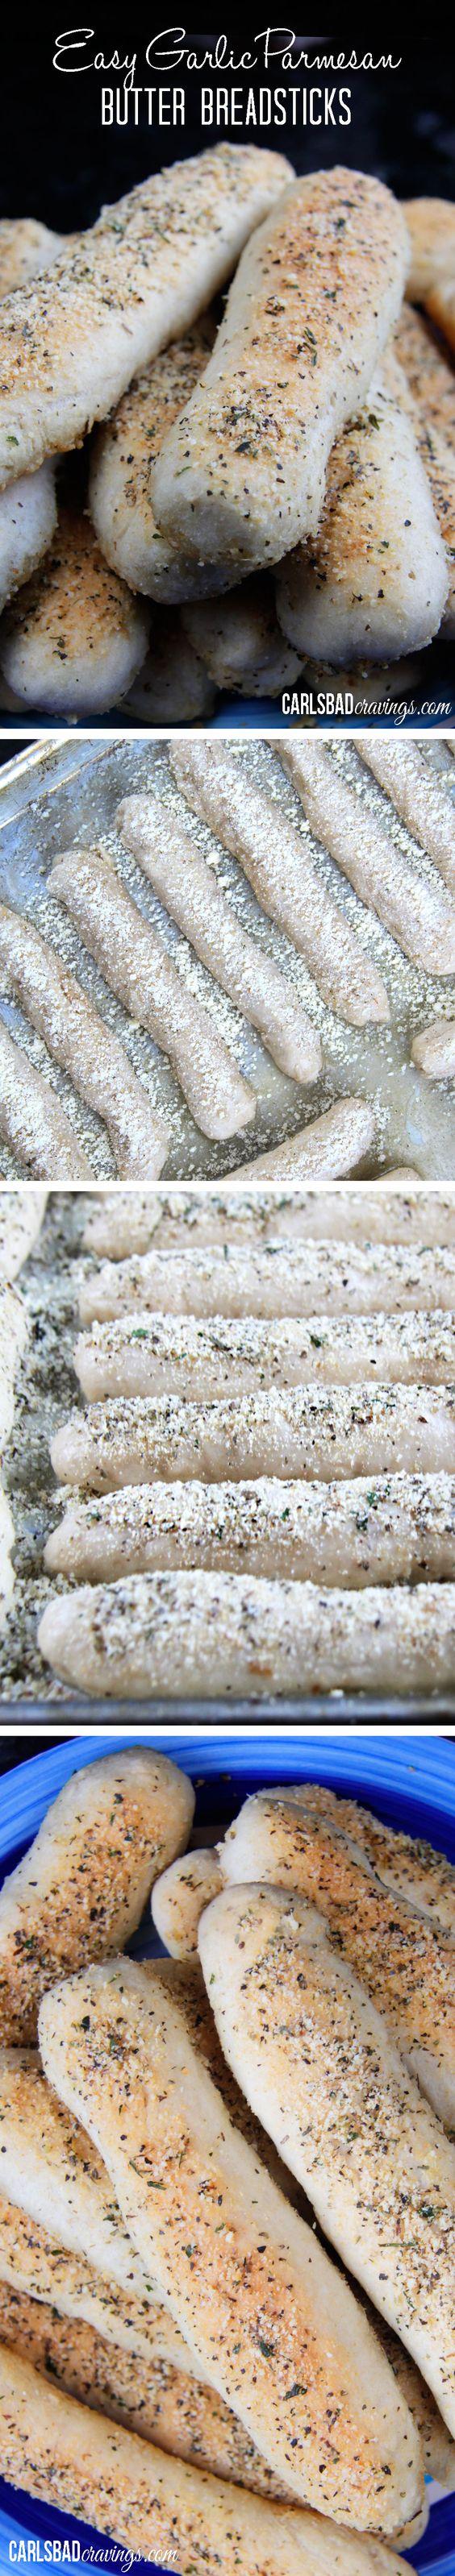 Easy Garlic Parmesan Butter Breadsticks | Recipe ...